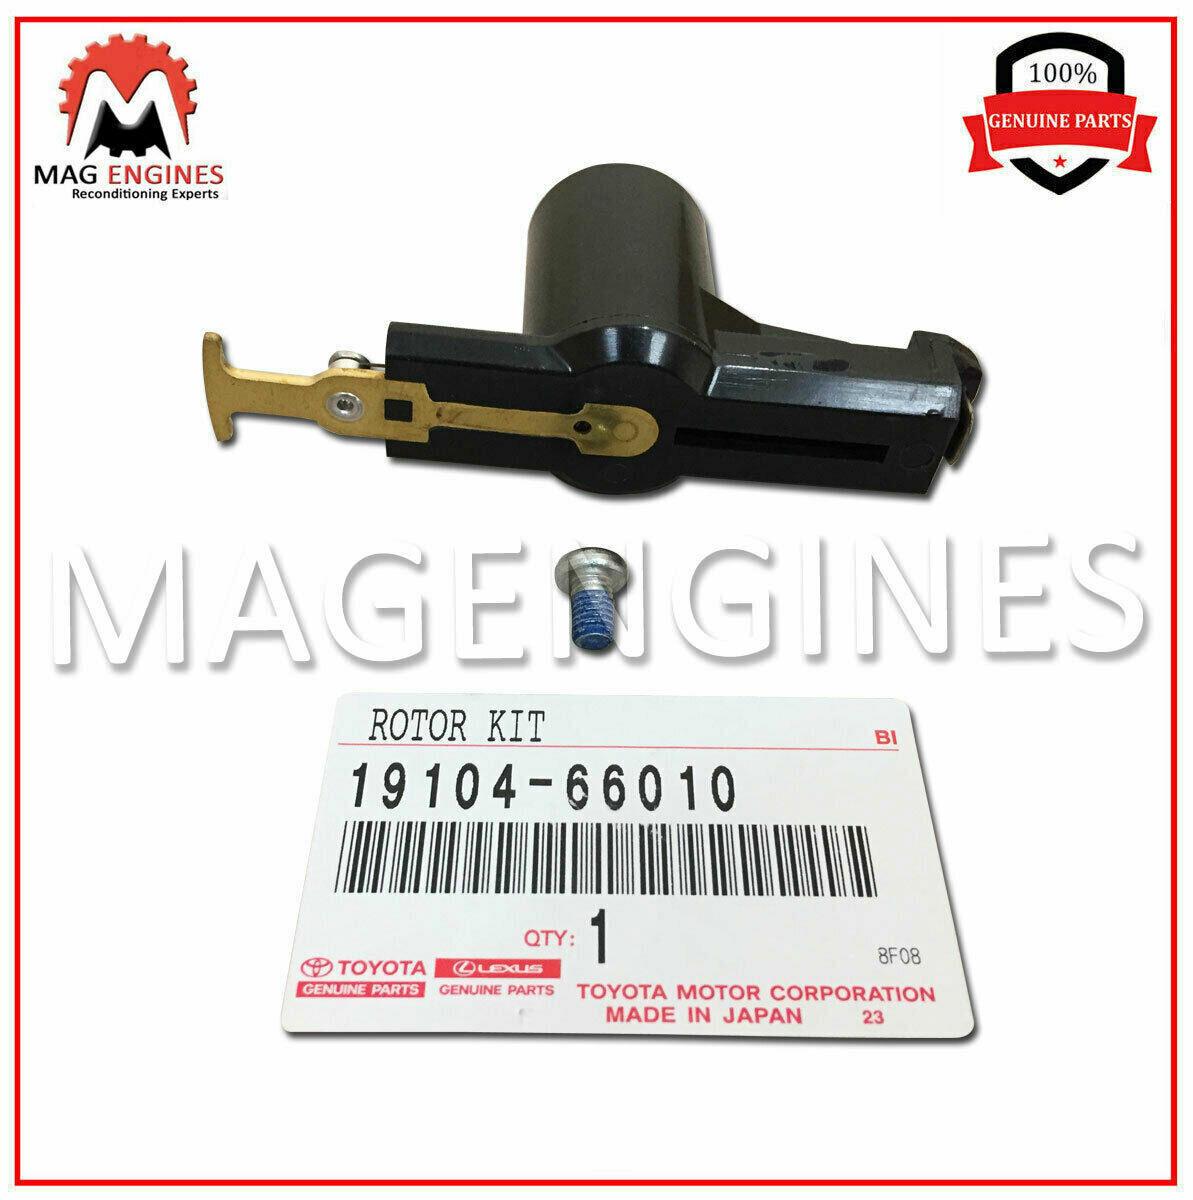 1910466010 Genuine Toyota ROTOR KIT 19104-66010